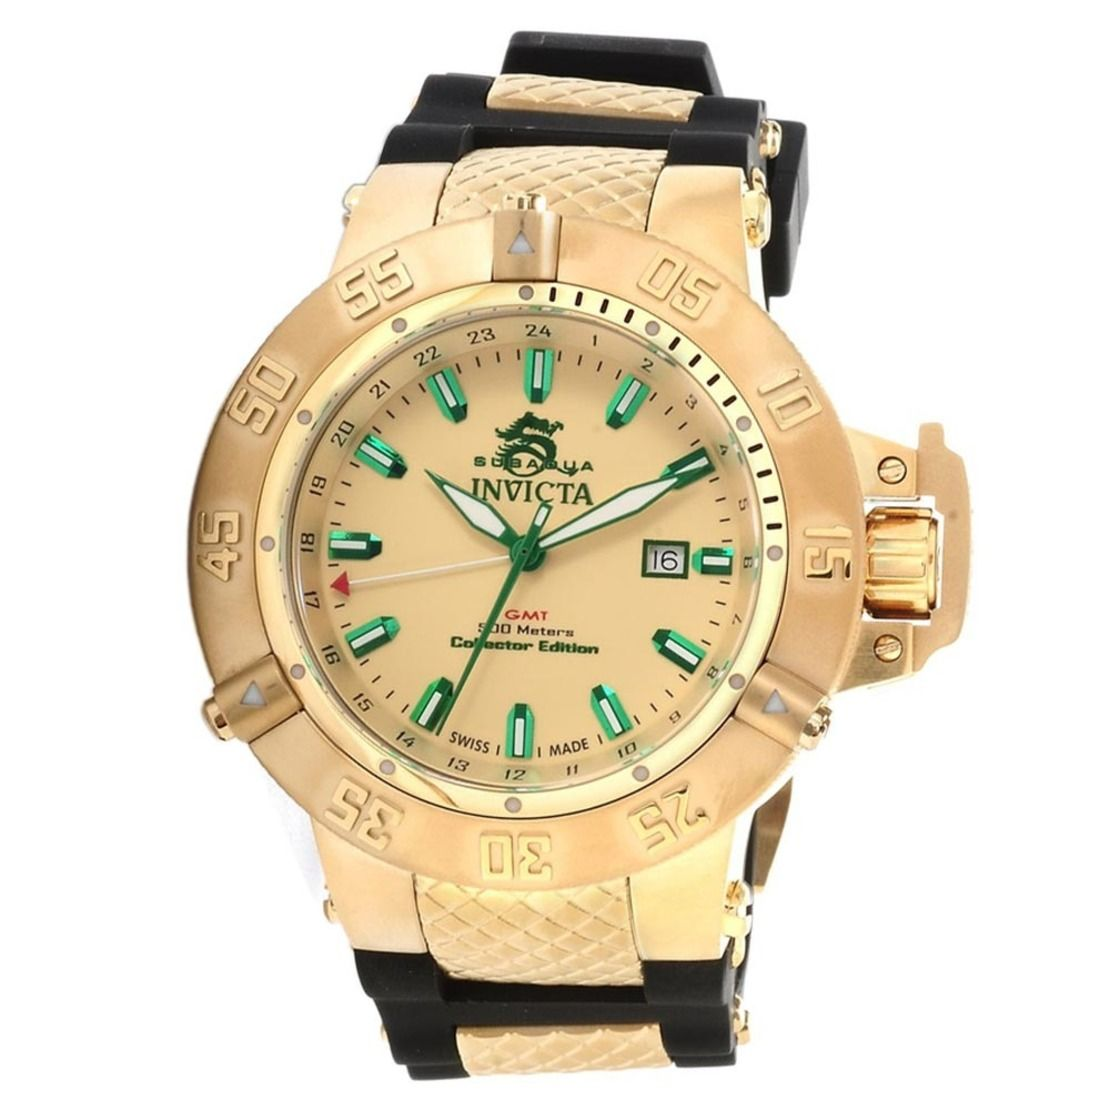 6a898a7618b Relógio Invicta Subaqua Noma III 13921